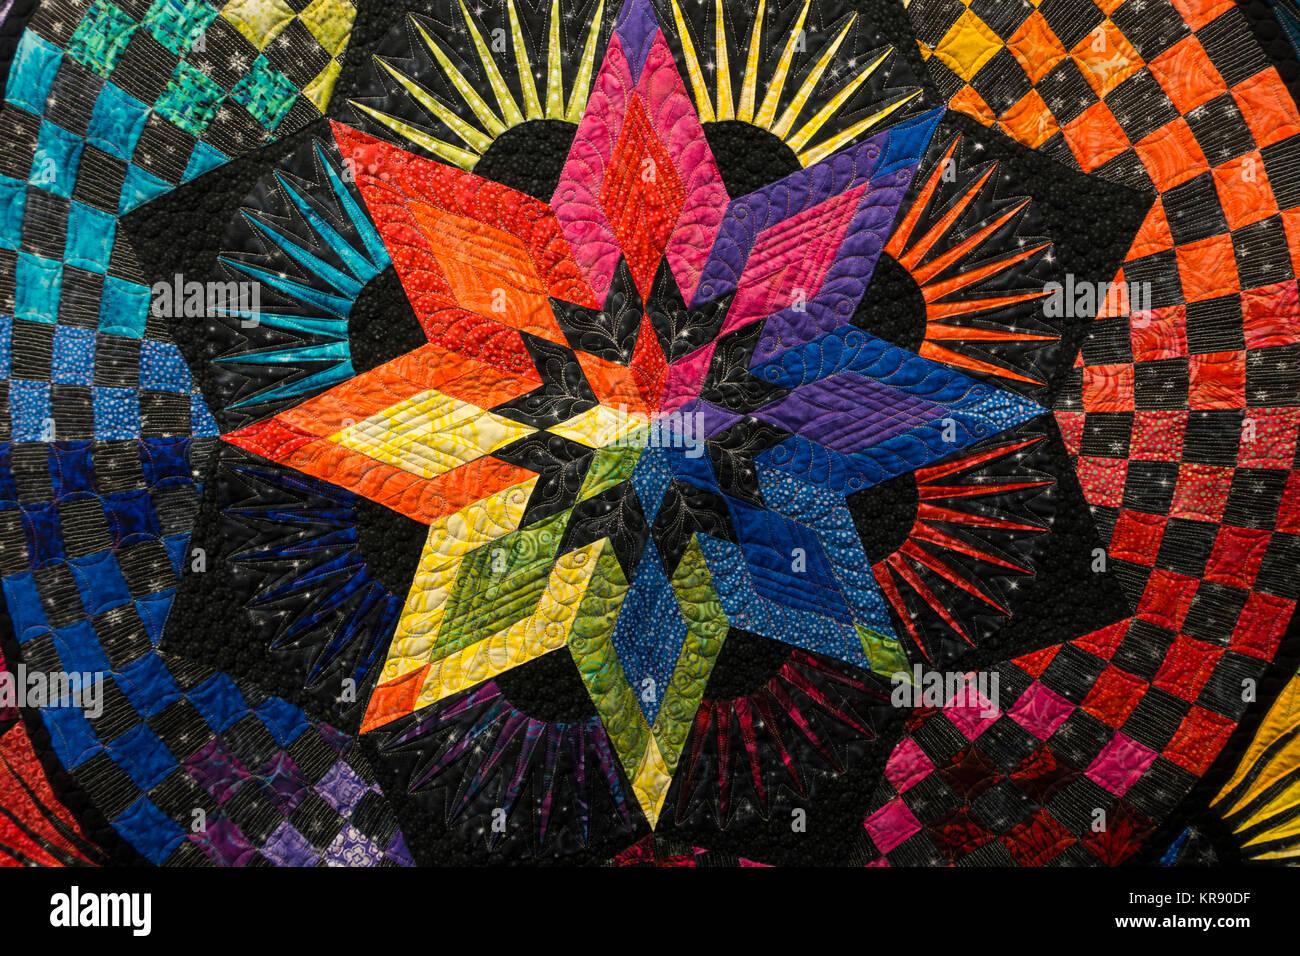 Star Quilt Pattern Stock Photos & Star Quilt Pattern Stock Images ... : quilt show manchester nh - Adamdwight.com